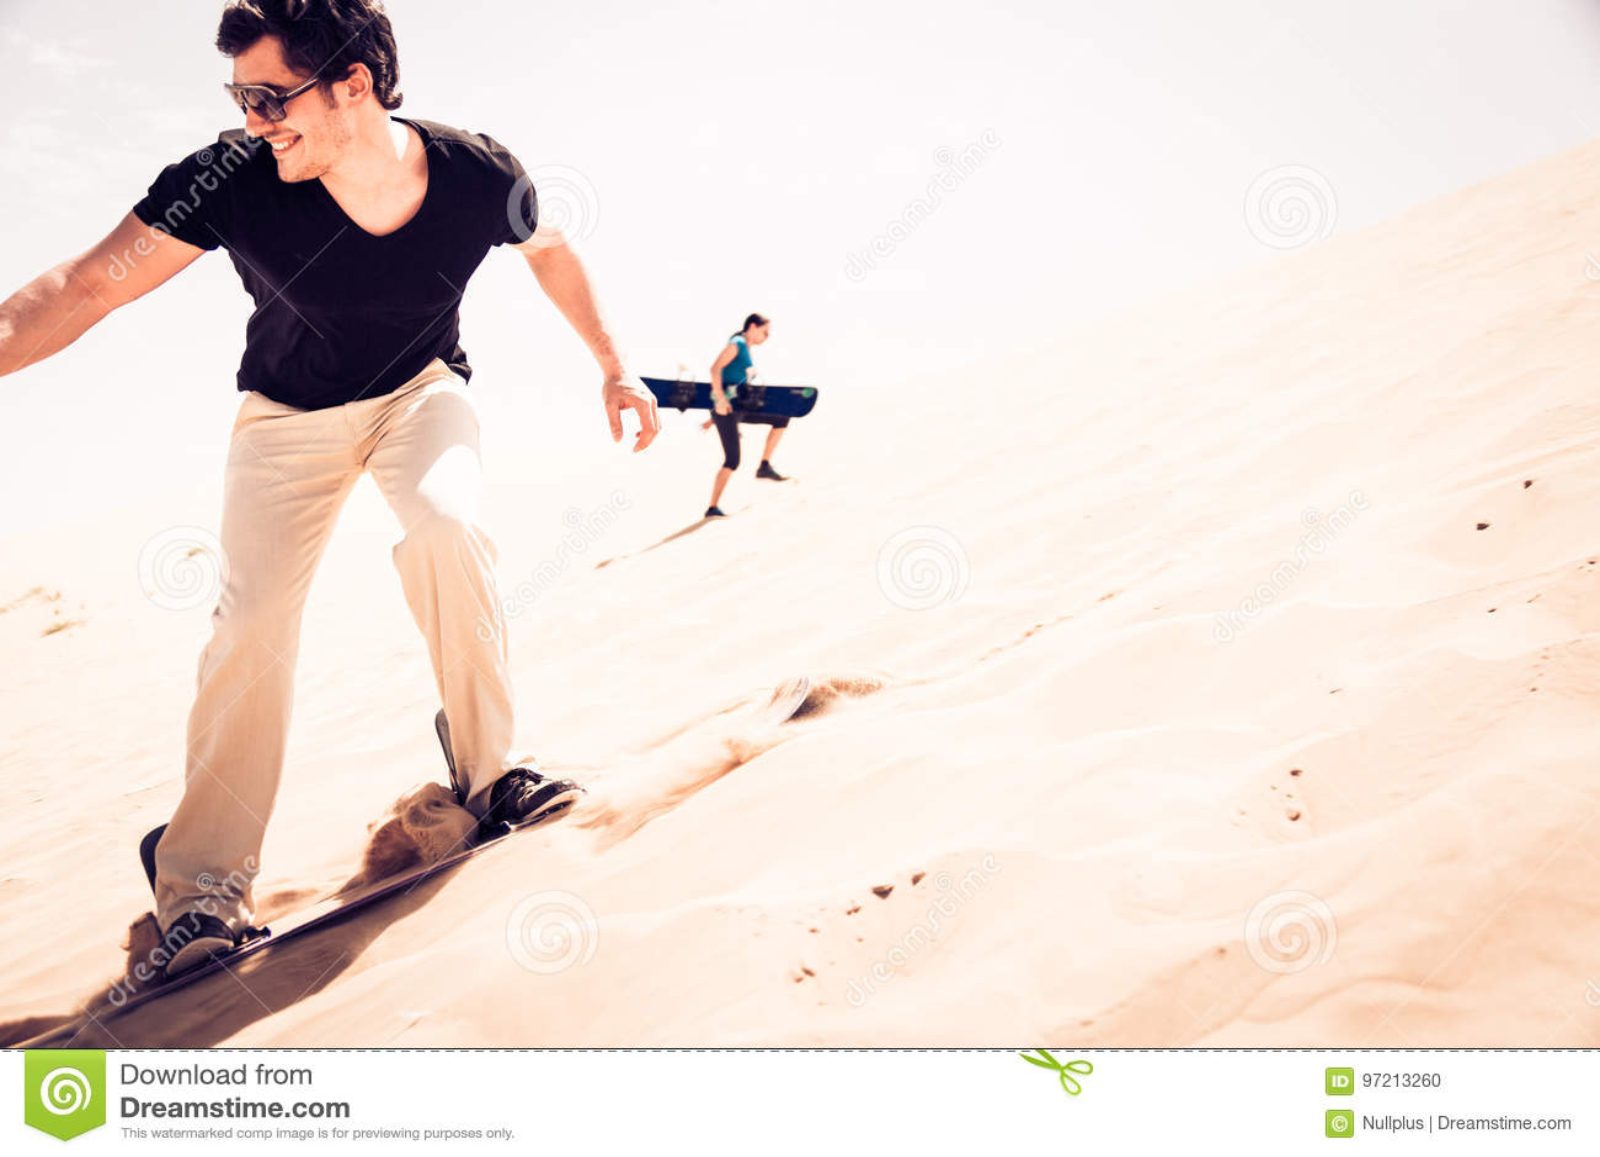 Tourist Sandboarding In The Desert Stock Photo - Image of